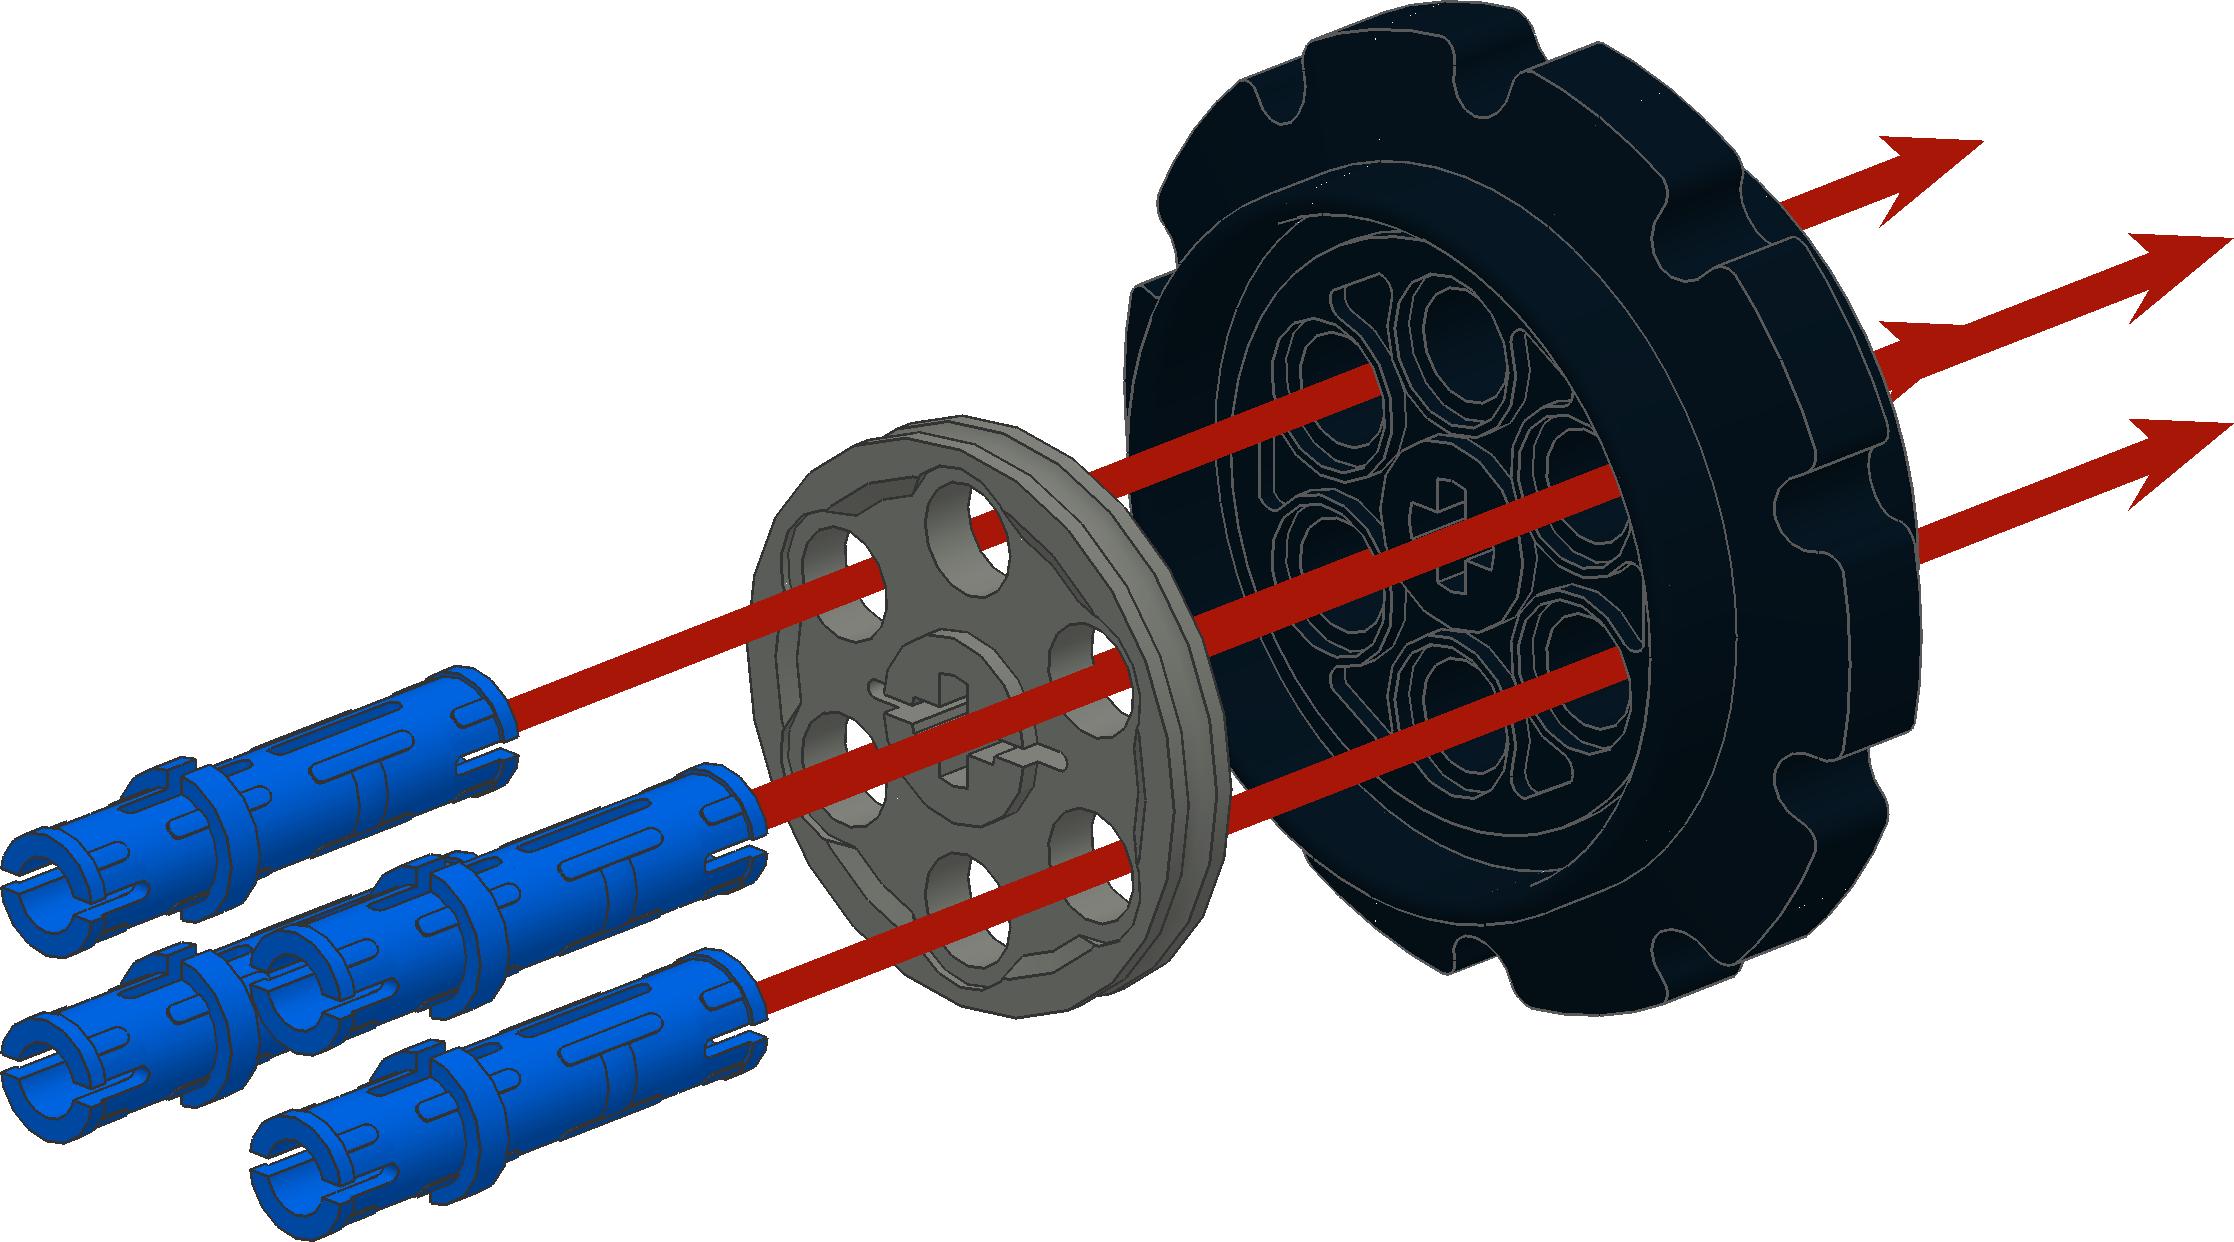 ev3wayet18_wheel_arrow_1_0_0_0_1_0_0_0_1_1_4960_600_DPI_1.png